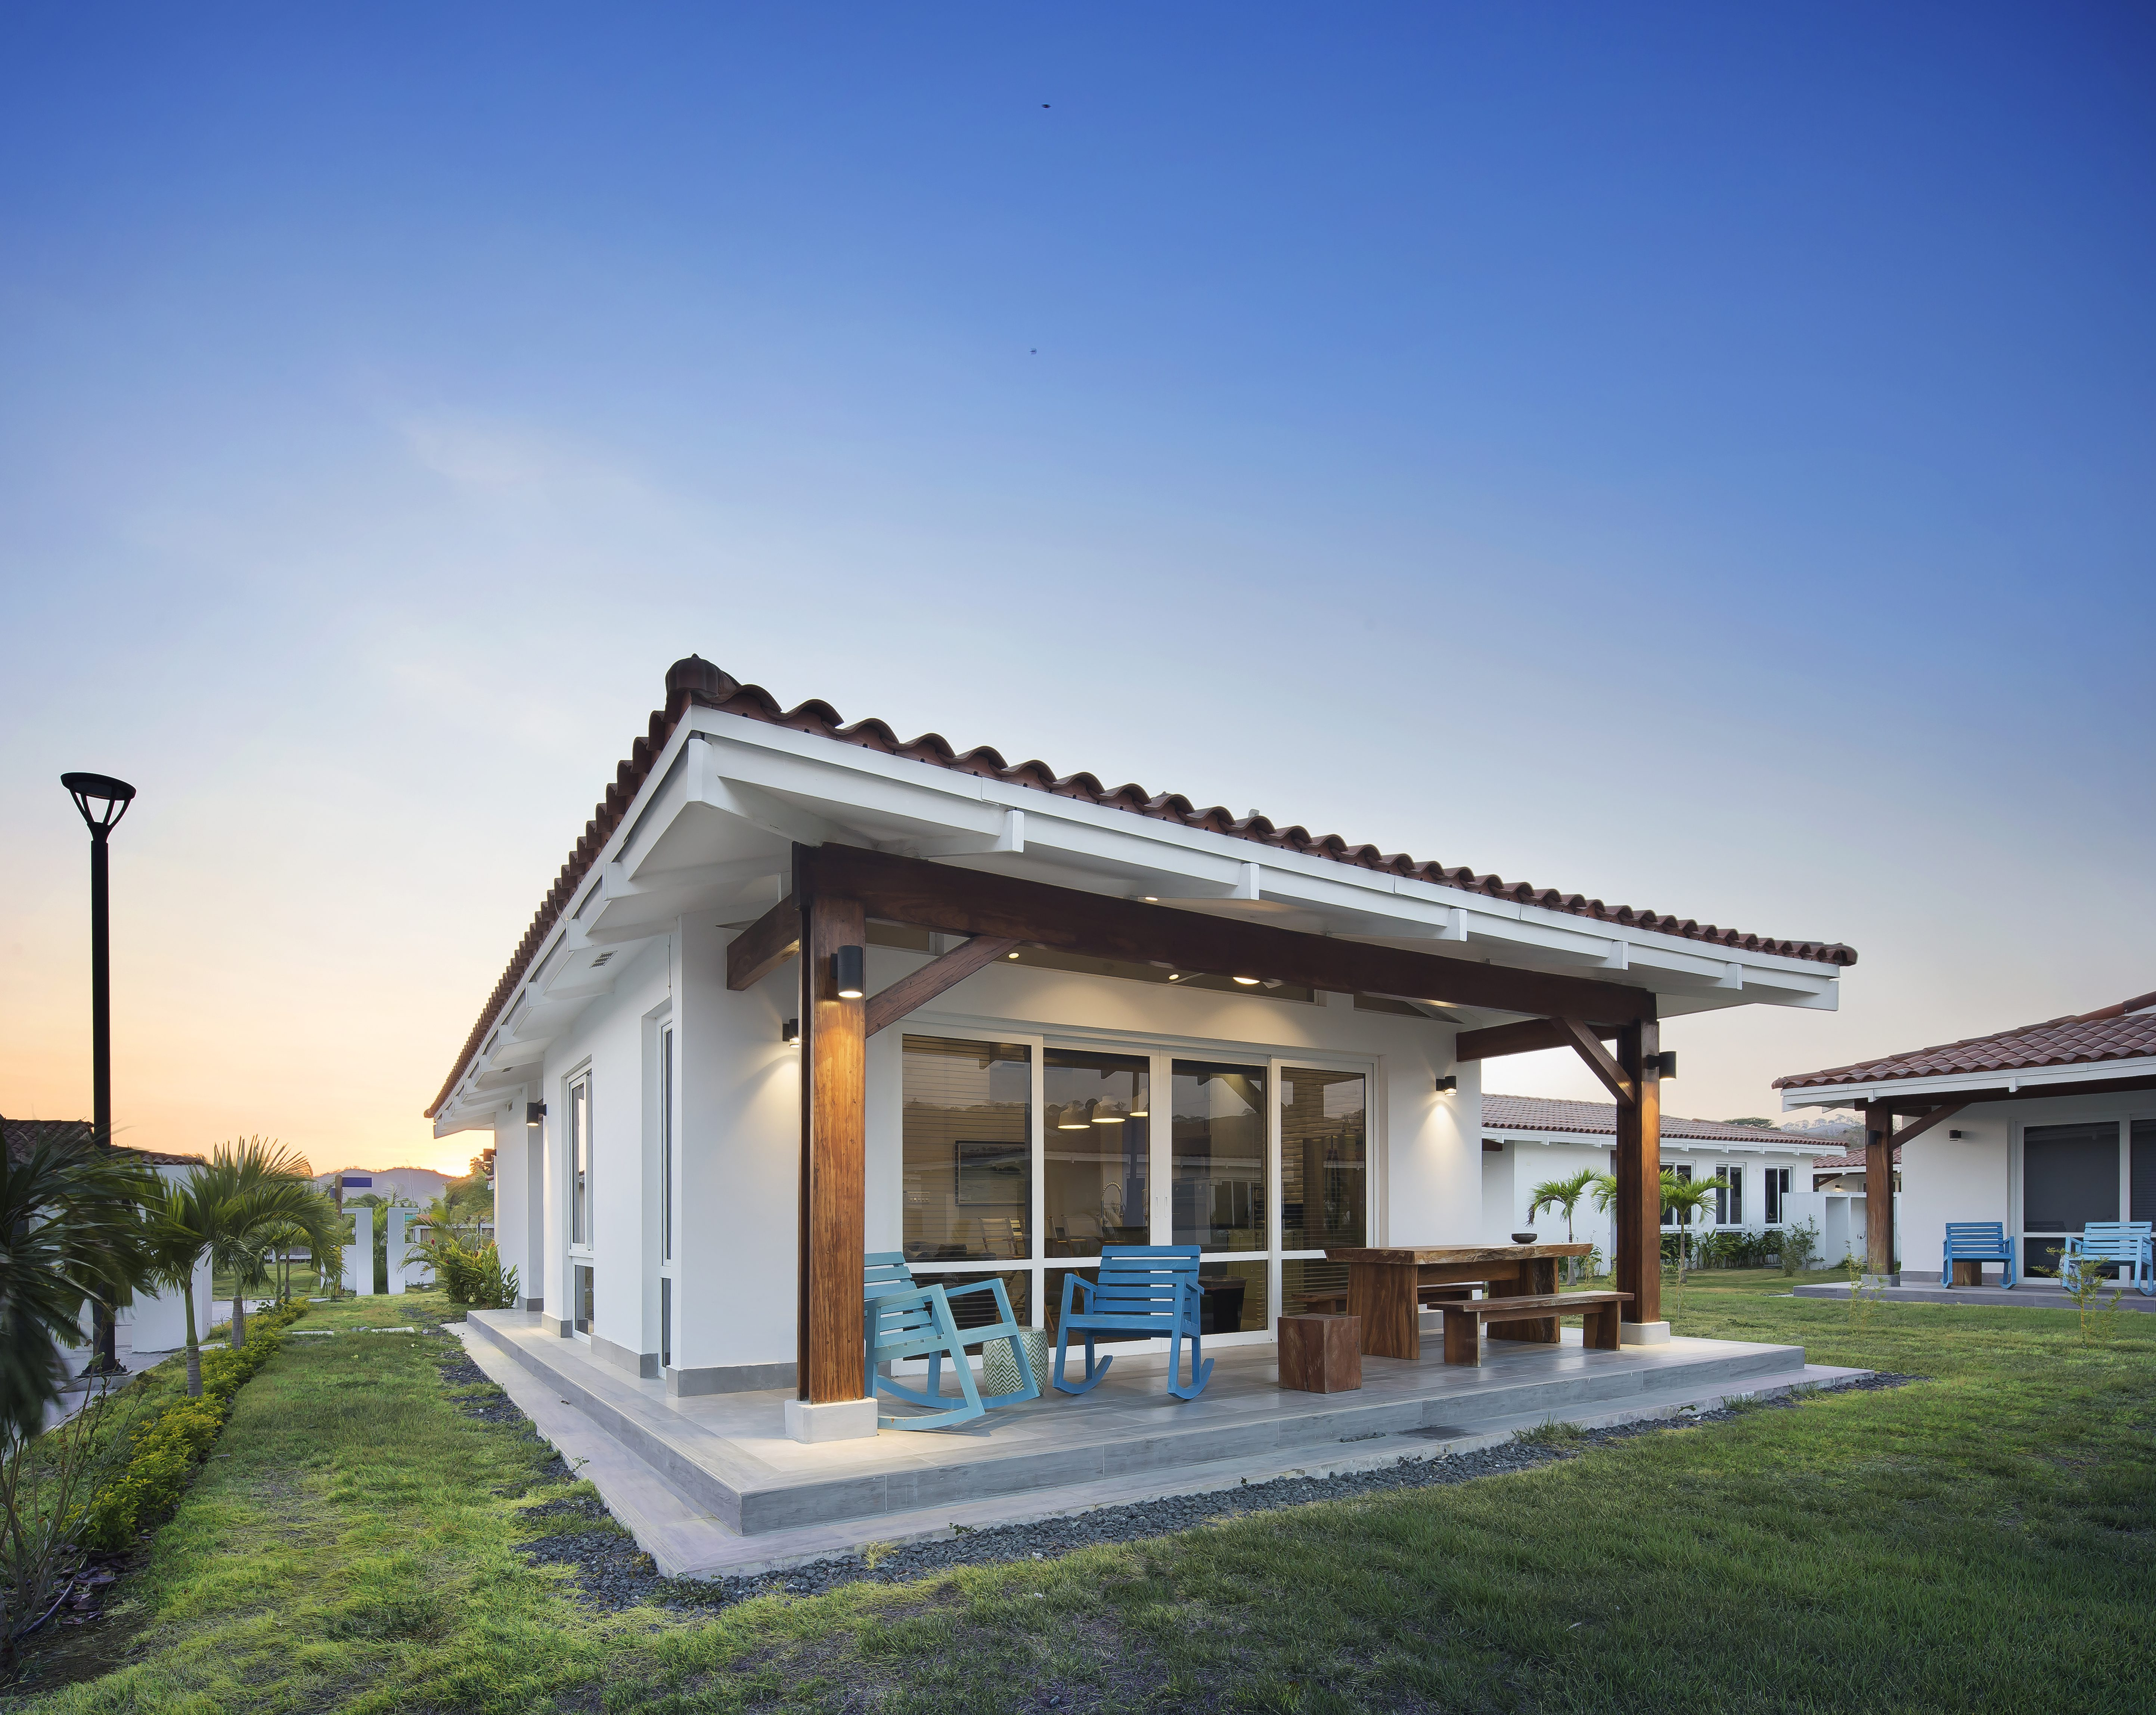 Blue Venao real estate development